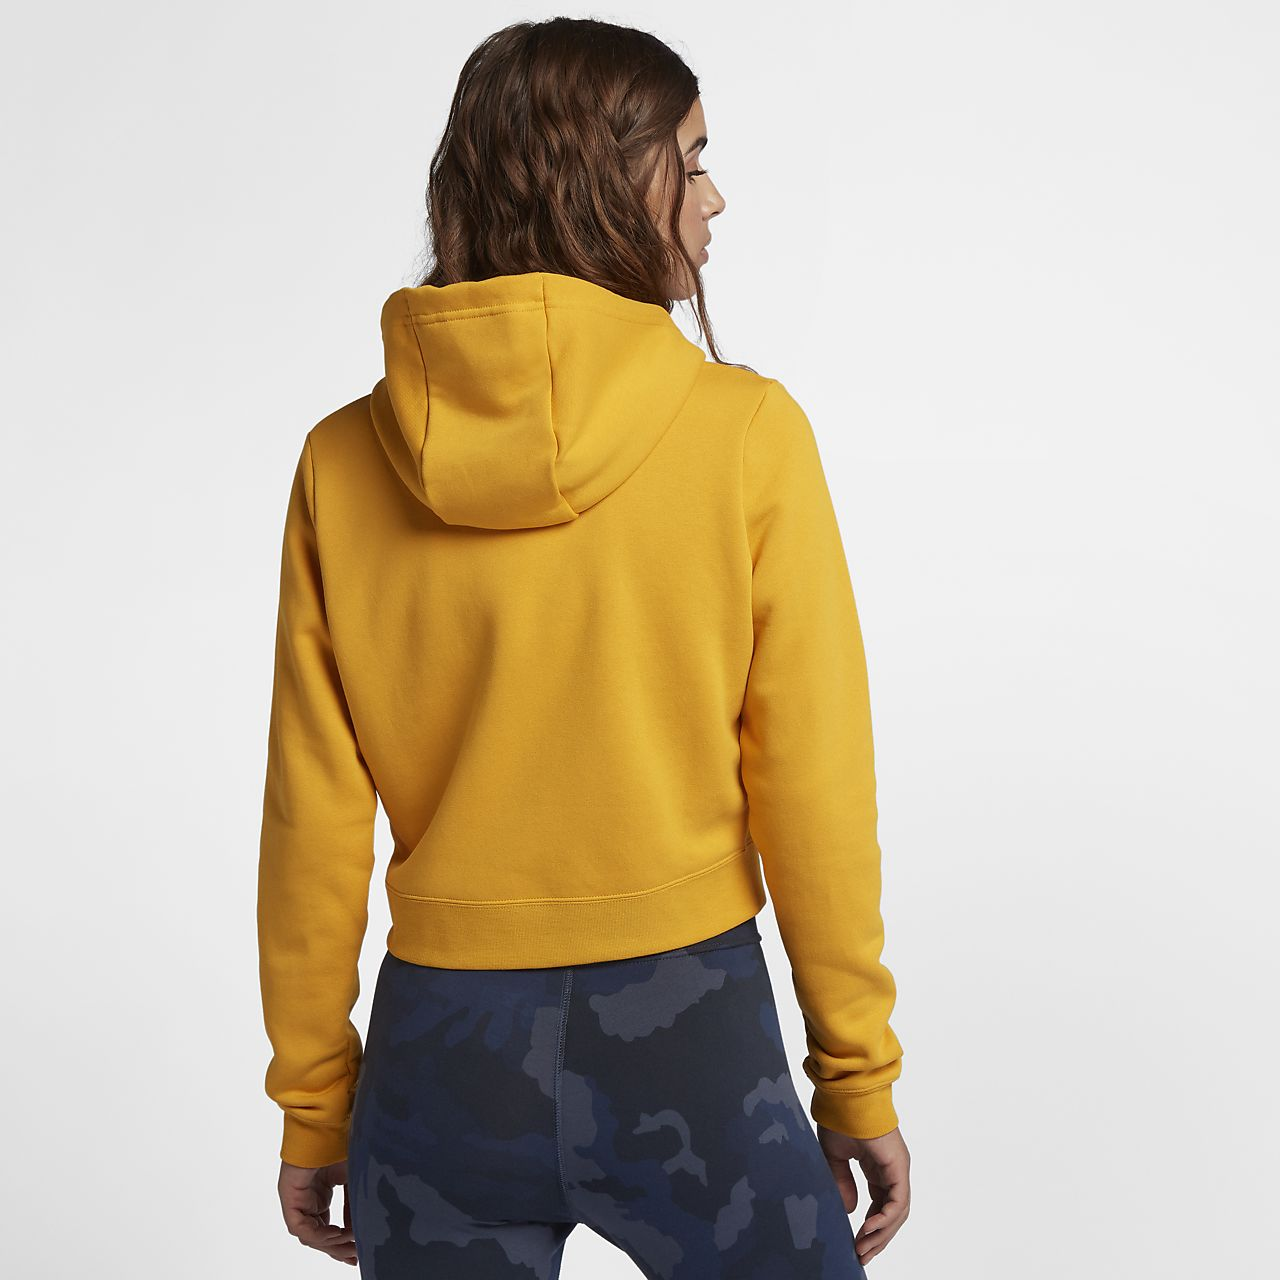 e8326ff8c6de Sudadera con capucha recortada para mujer Nike Sportswear Rally ...